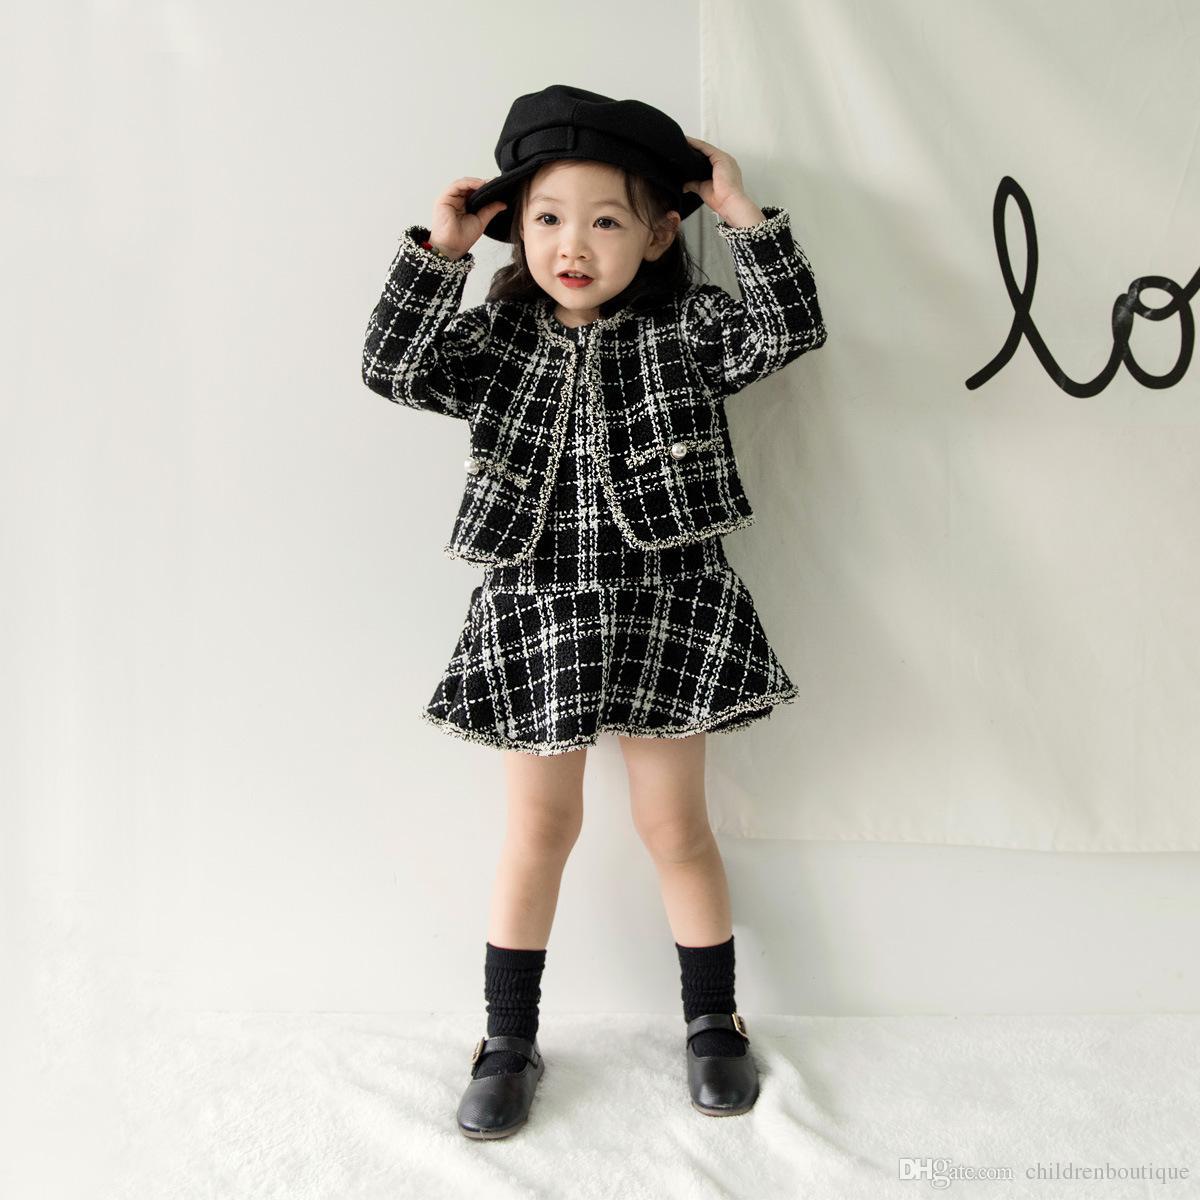 25c39cdee Baby Clothes Children Clothing Sets New Autumn Fashion Baby Girls Grid  Coat+Dress 2Pcs Set Elegant Xmas Princess Dress Set For Kids 0-5T